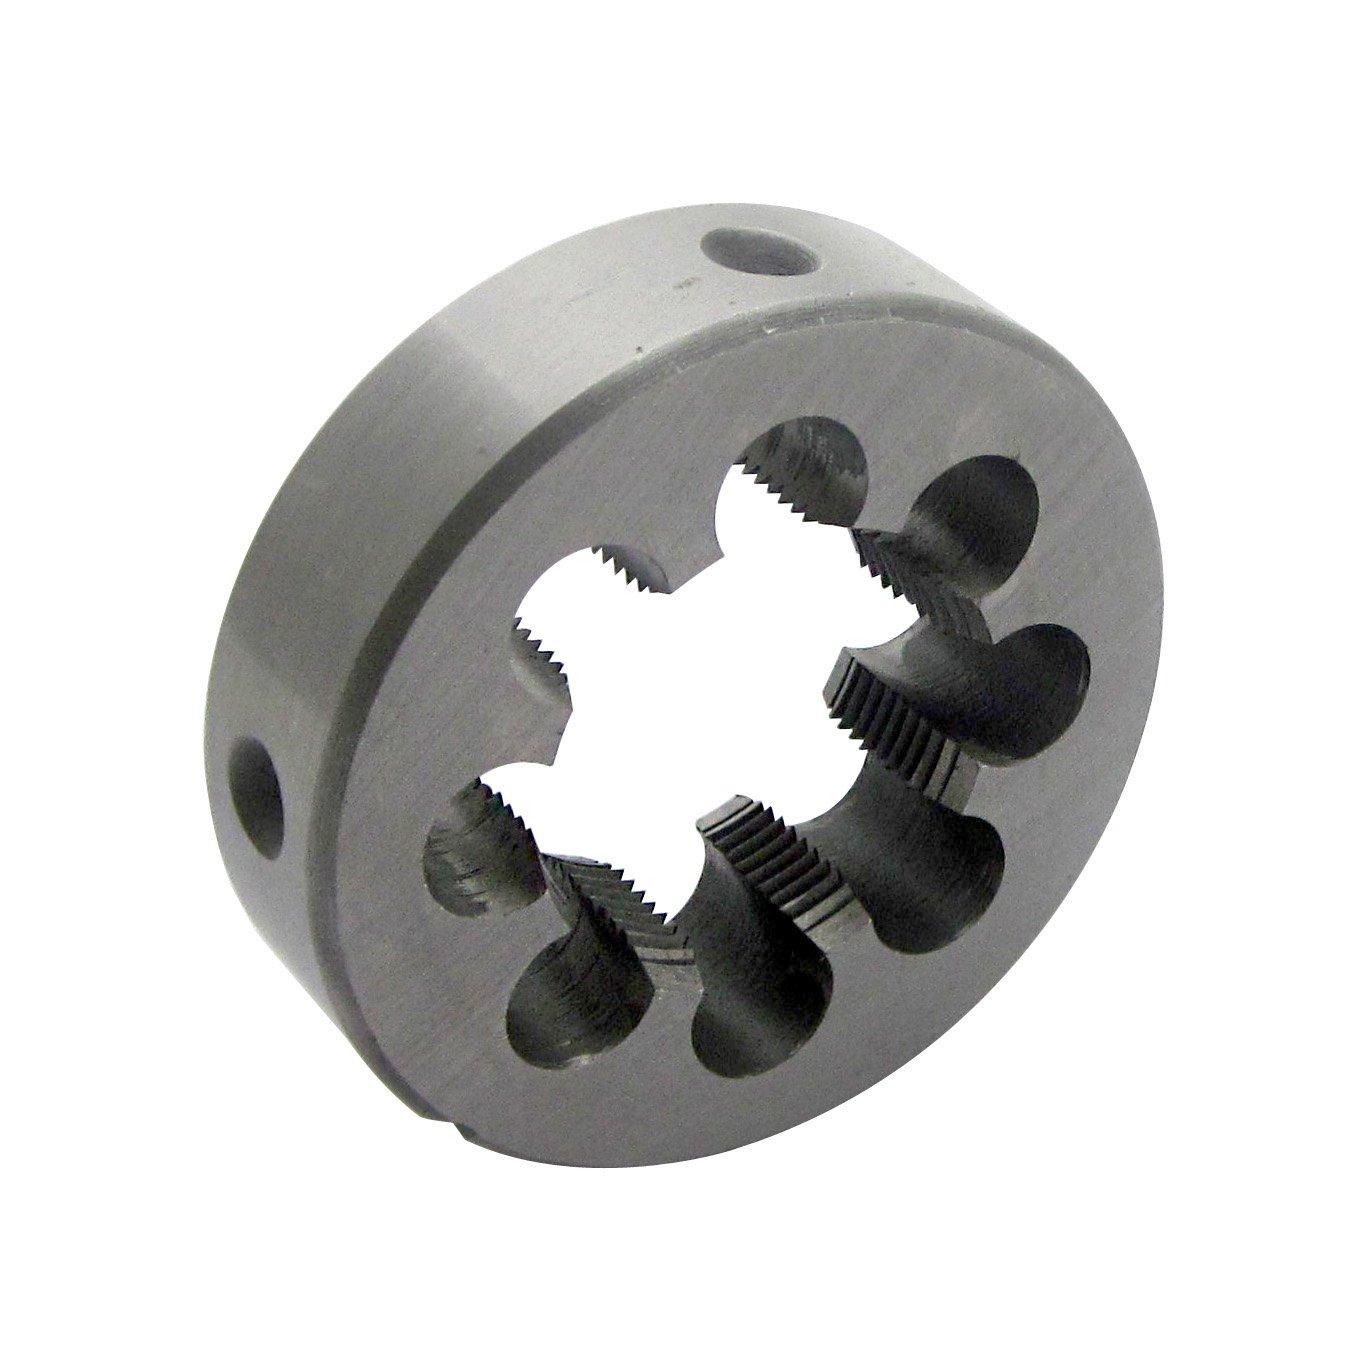 M20 x 1.25 mm Pitch Thread Metric Right Hand Die 20 x 1.25 Thread Tool